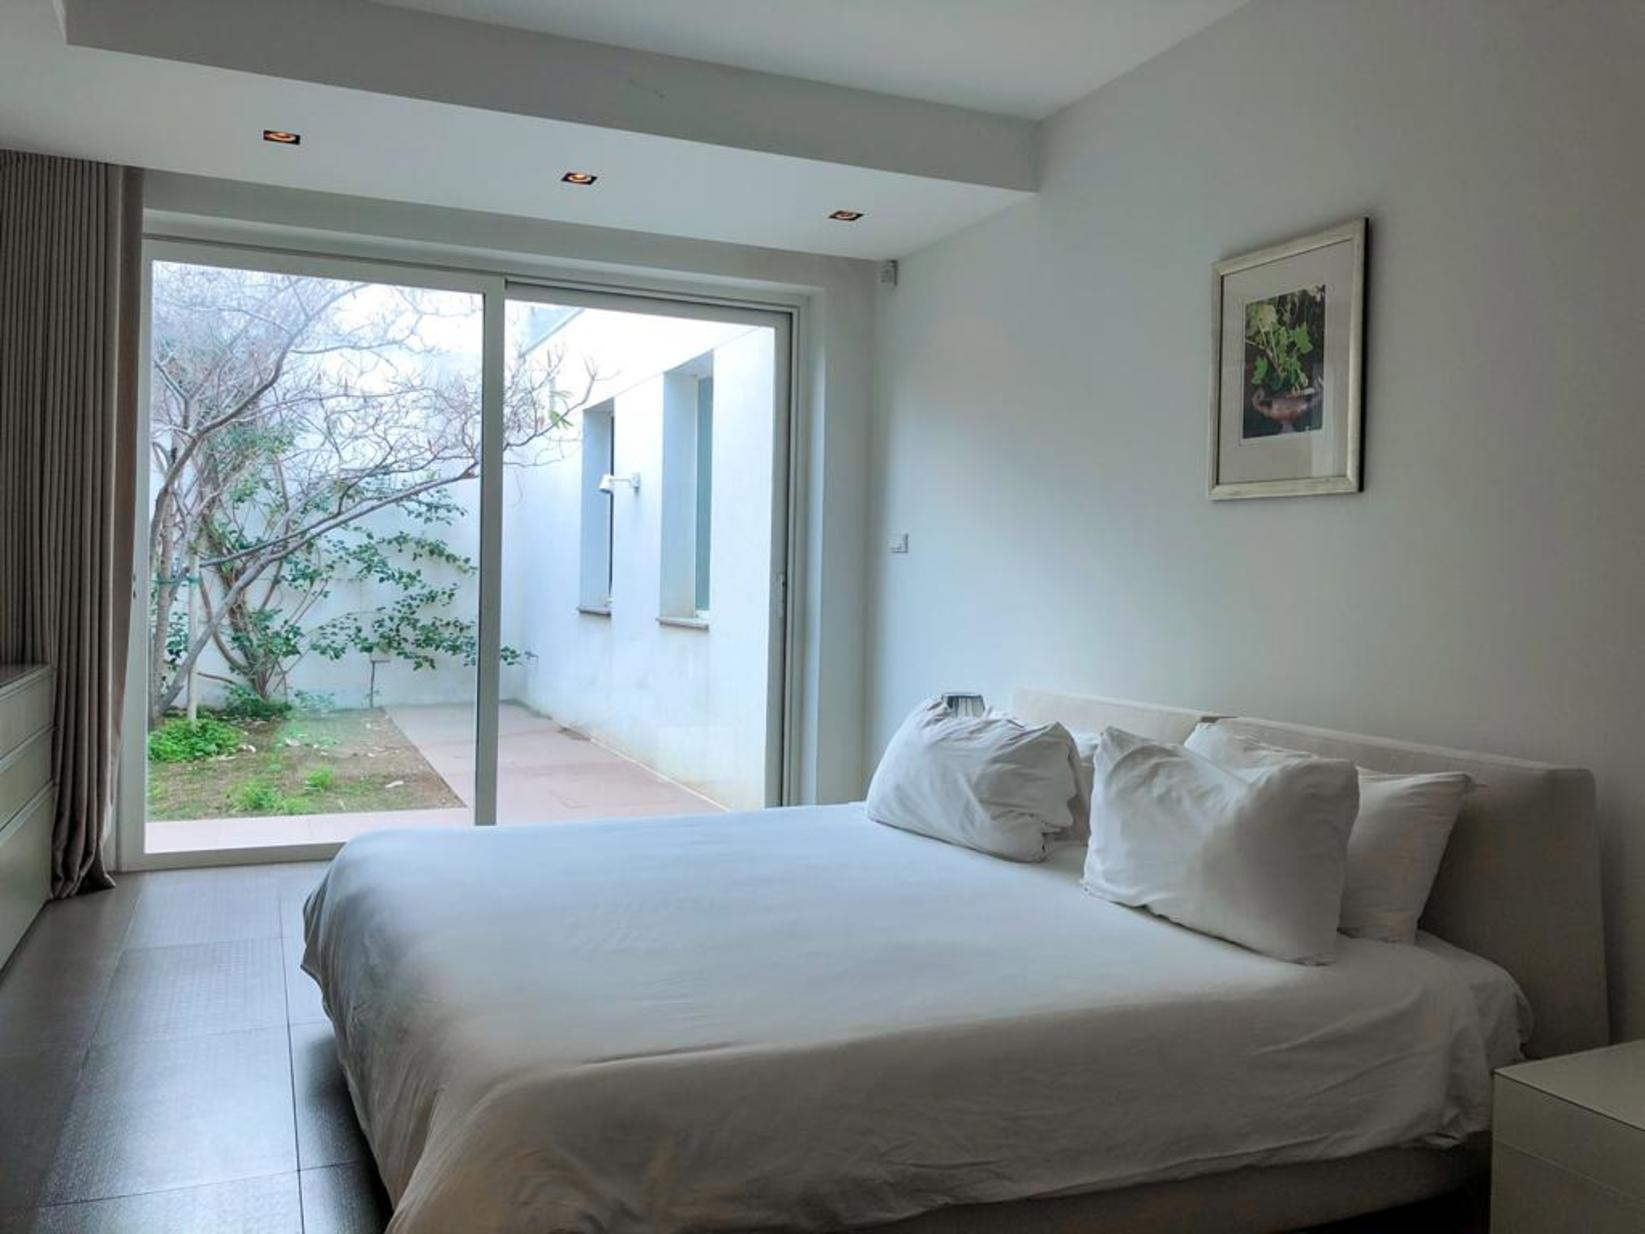 3 bed Villa For Rent in Bahar ic-Caghaq, Bahar ic-Caghaq - thumb 19